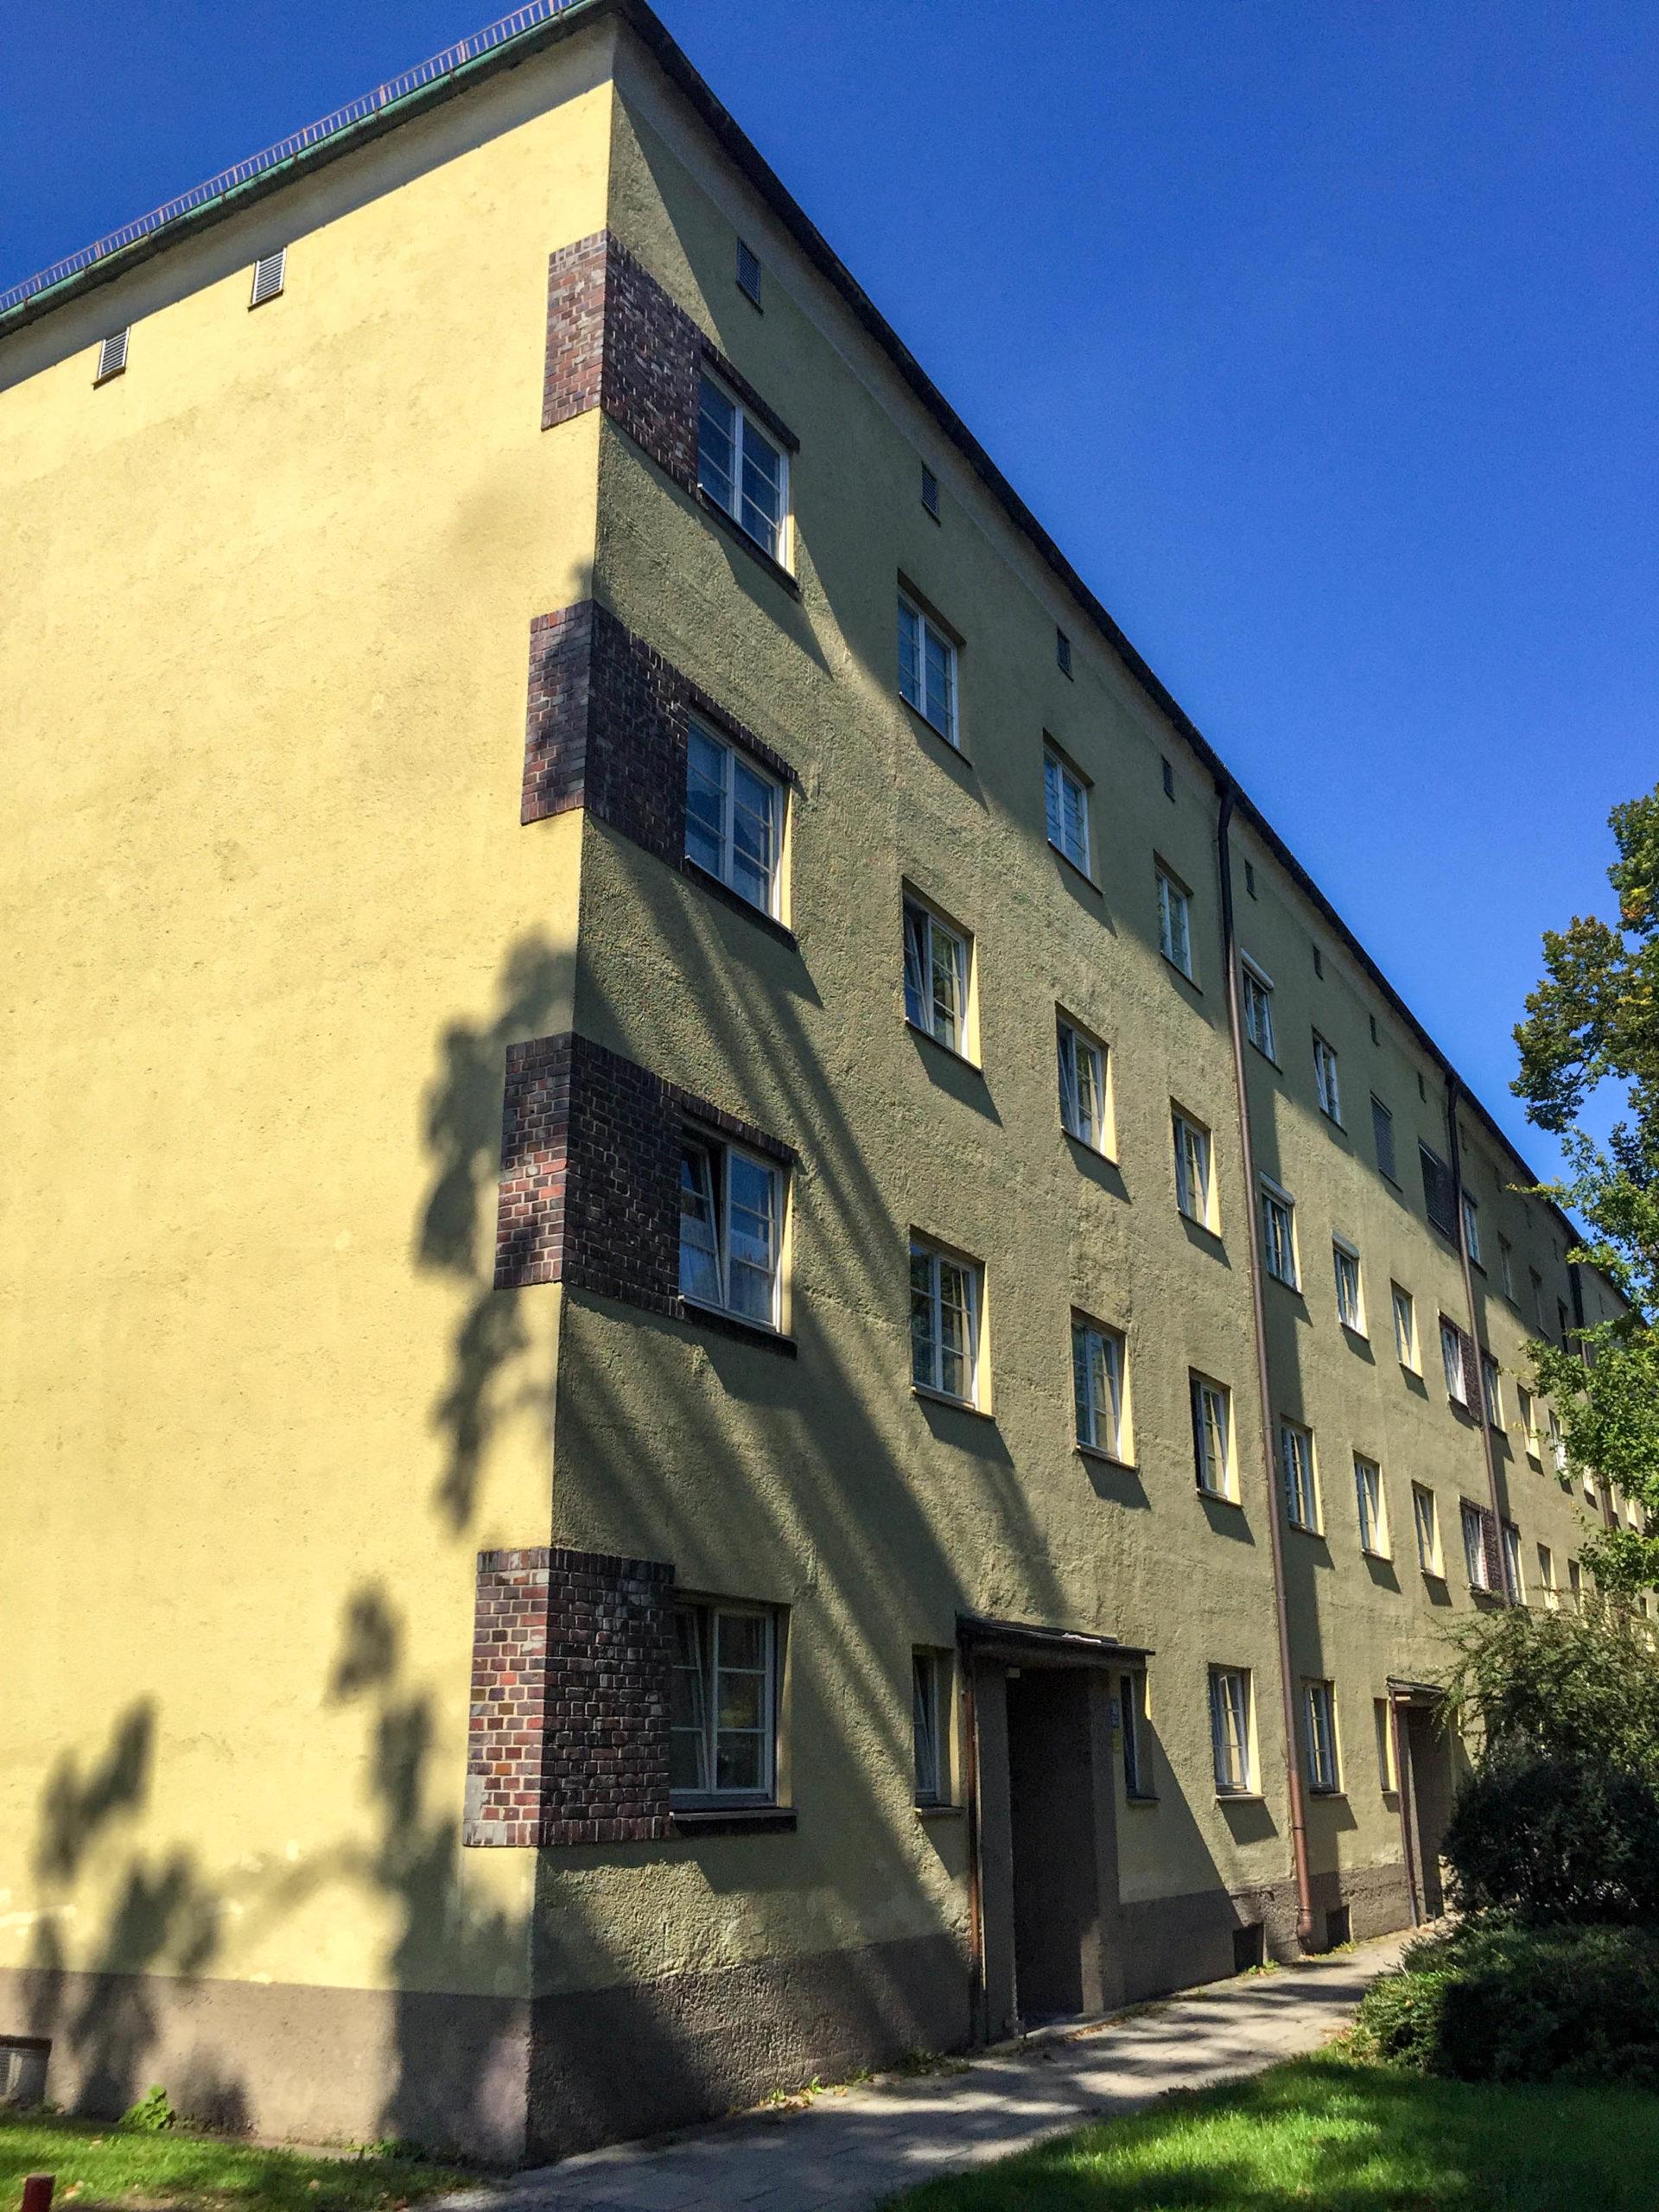 Siedlung Neuramersdorf, 1928-1930. Architekten: Oscar Delisle, Bernard Ingwersen, Richard Berndl